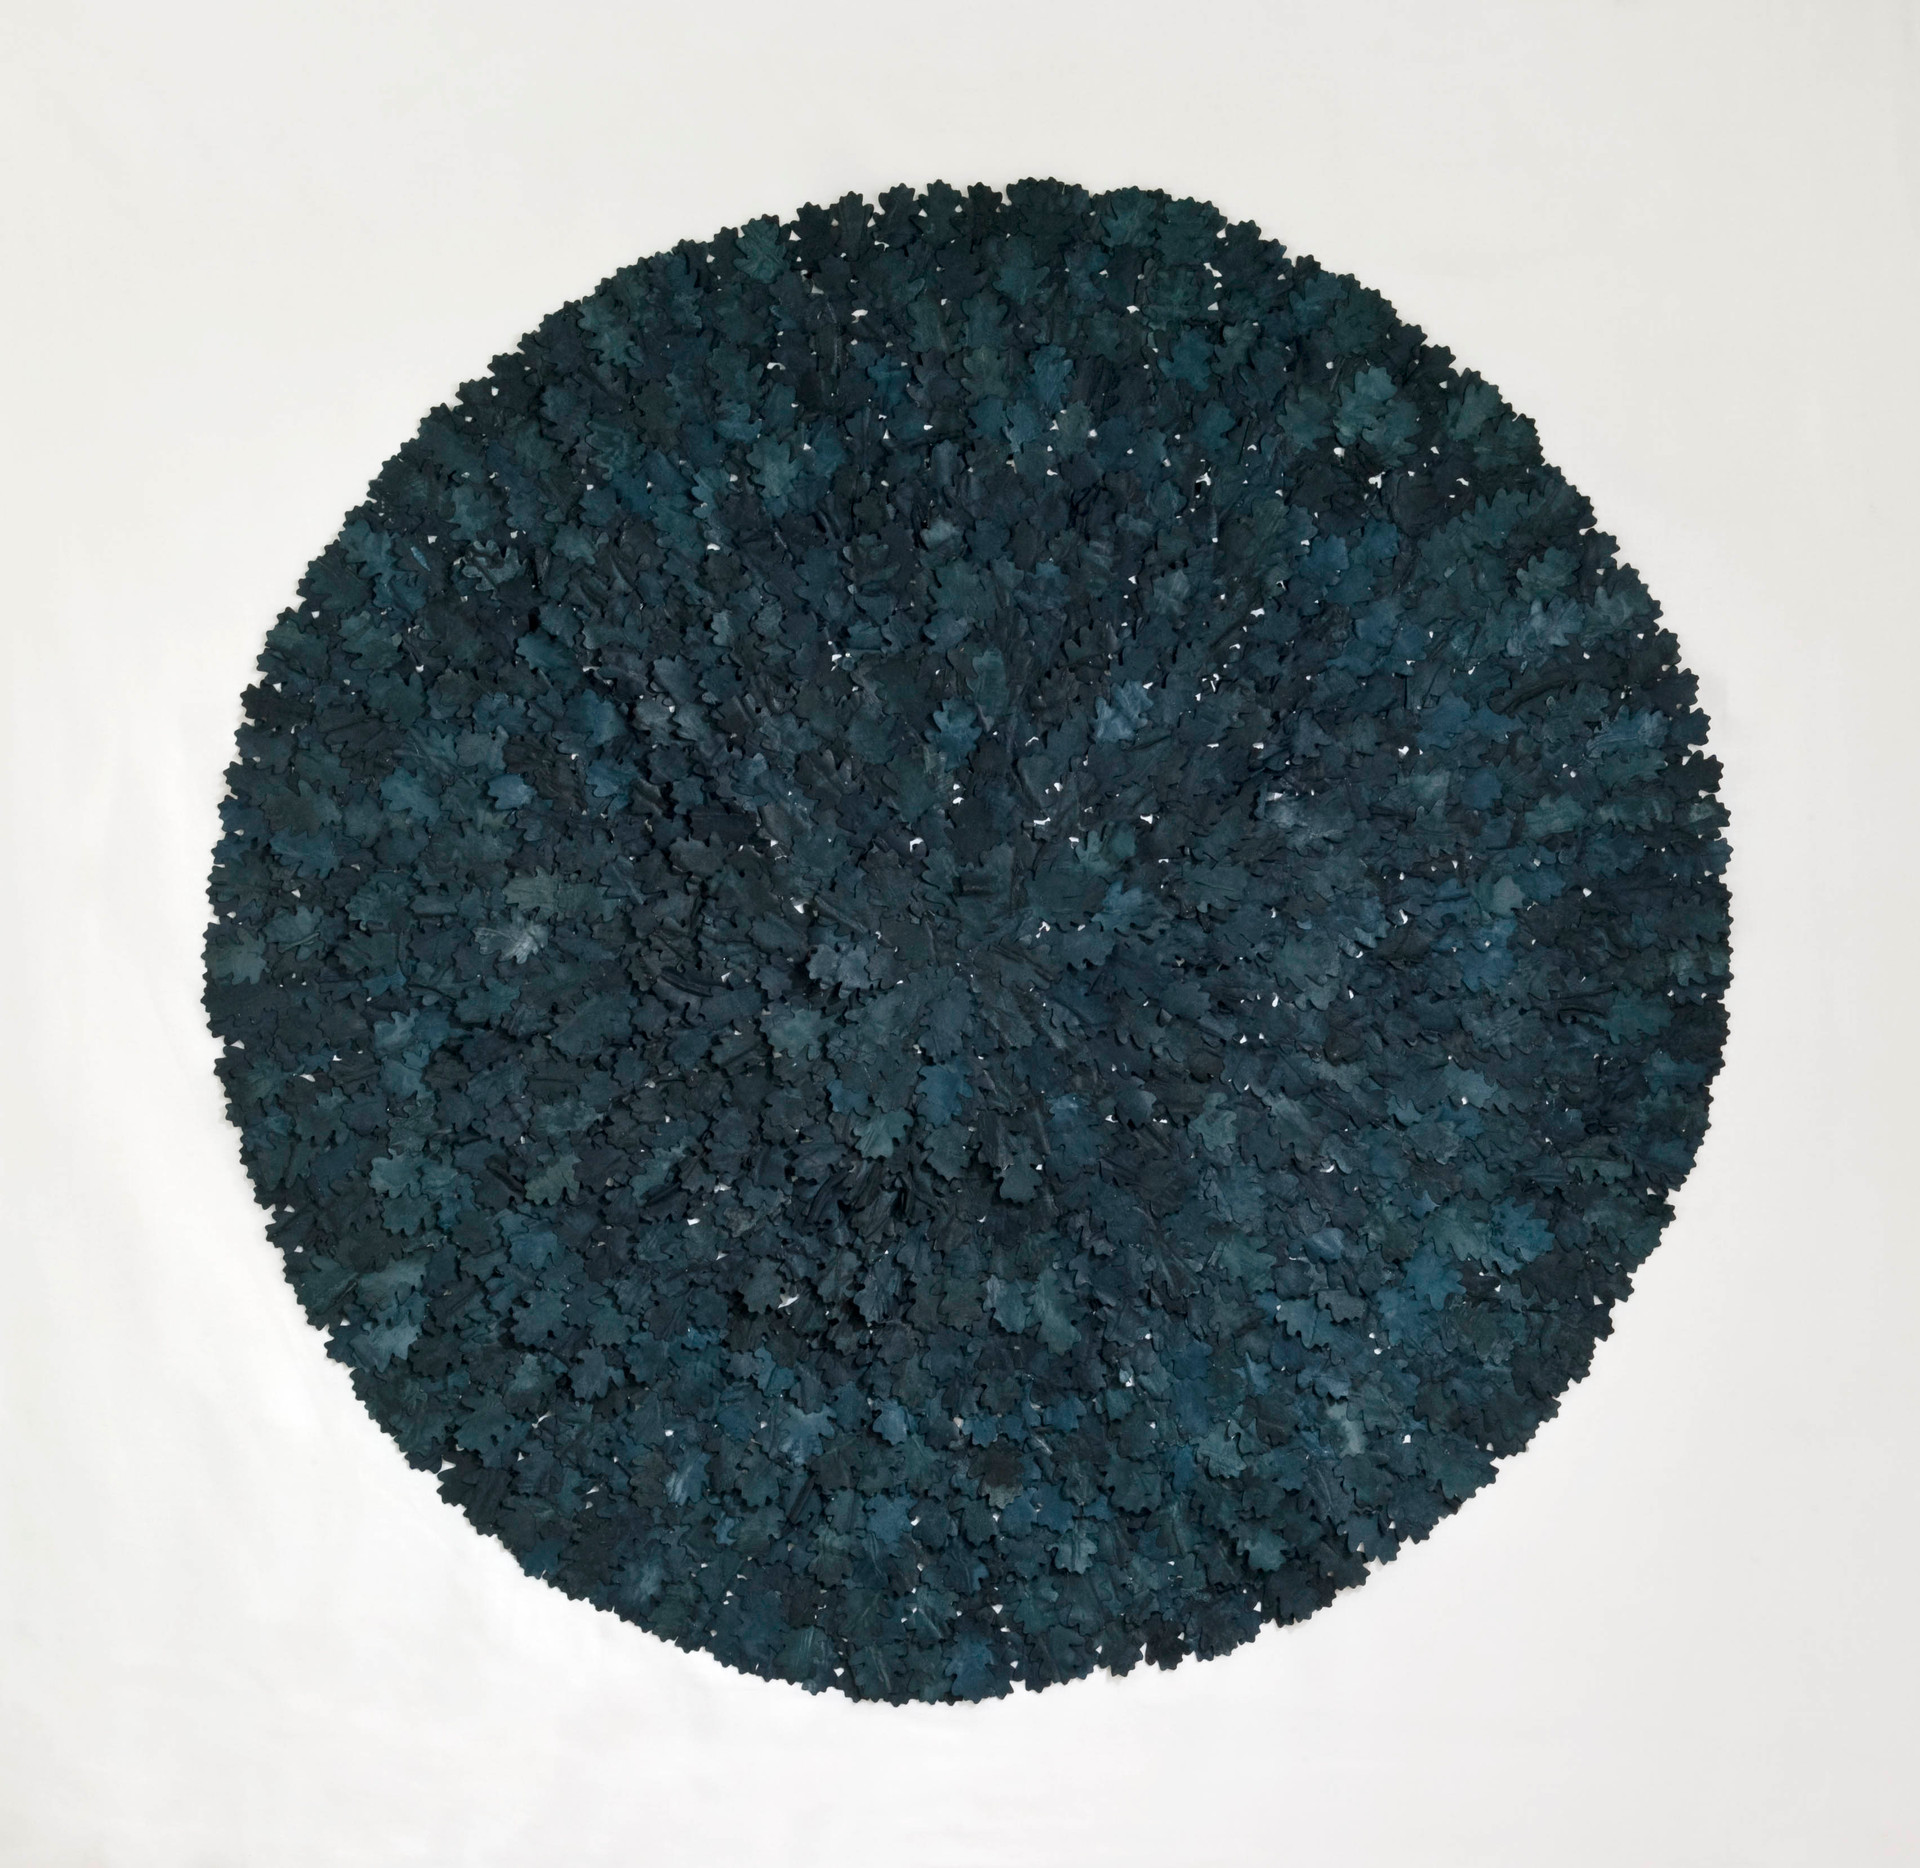 Black oak/2012/Silk Paper Ink/122x122 cm